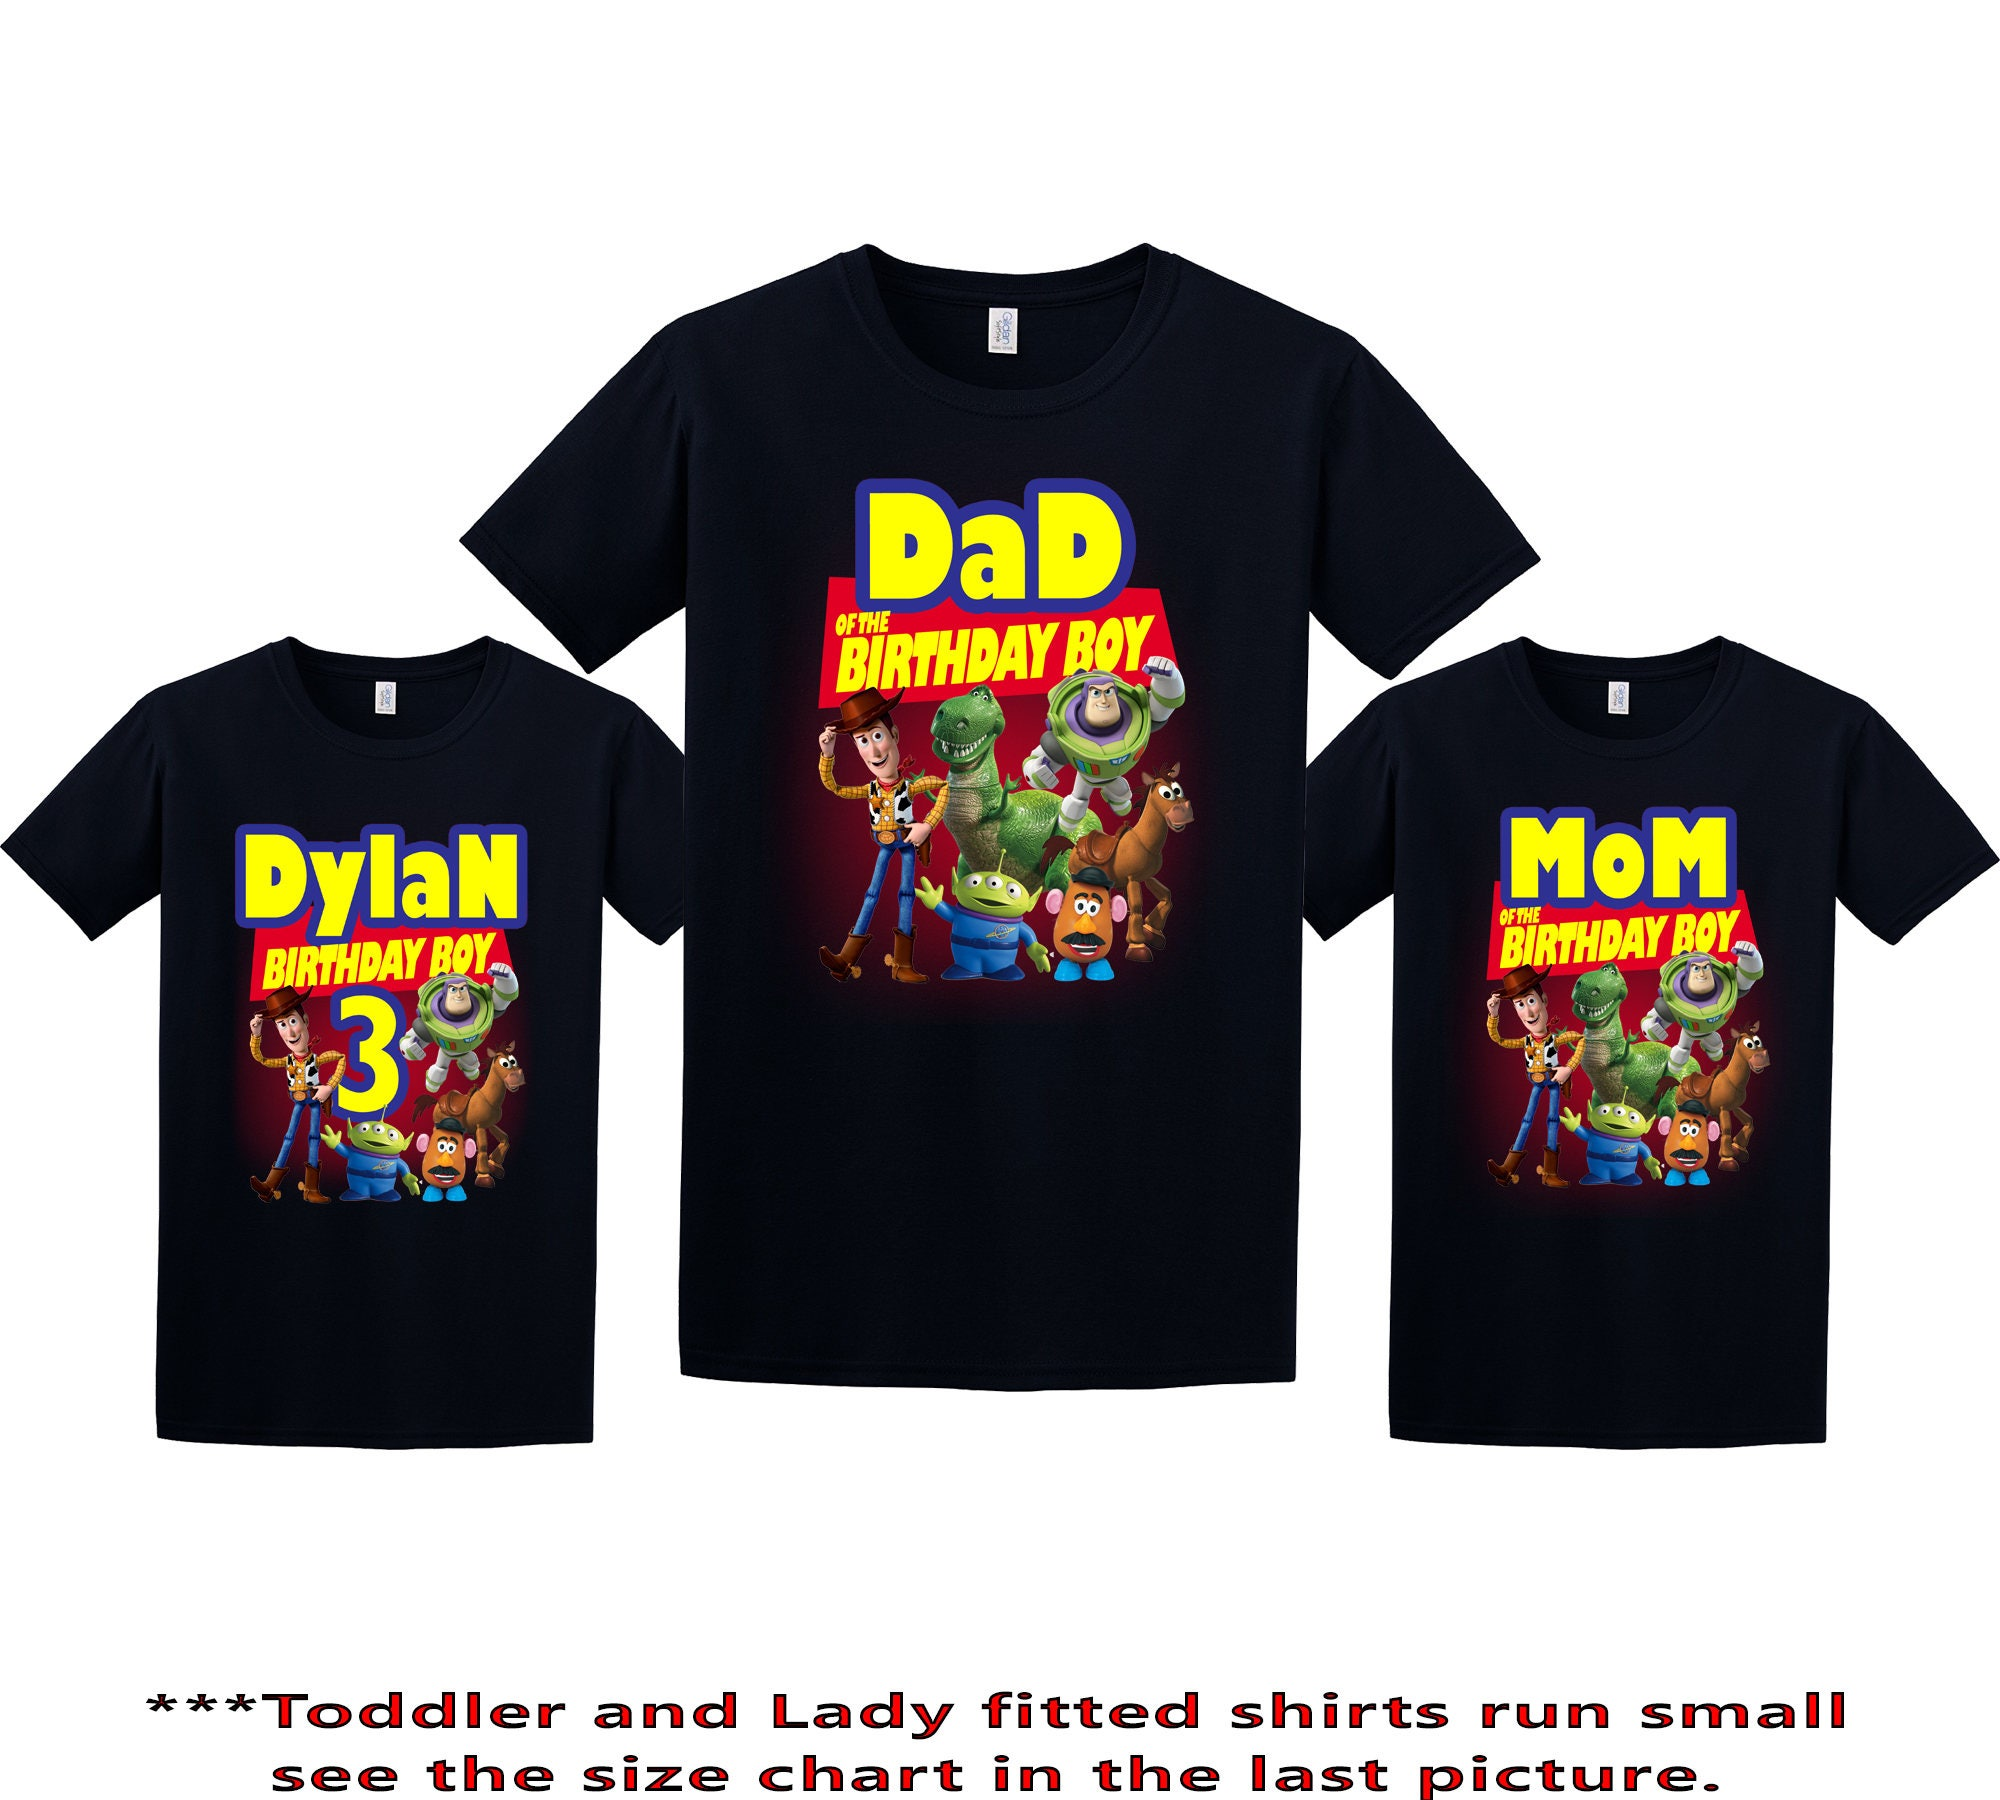 2243b0056b2ca Toy Story Birthday Shirt, Toy Story Custom Shirt, Personalized Toy Story  Shirt, Toy Story family shirts, Birthday t-shirt for girls and boys